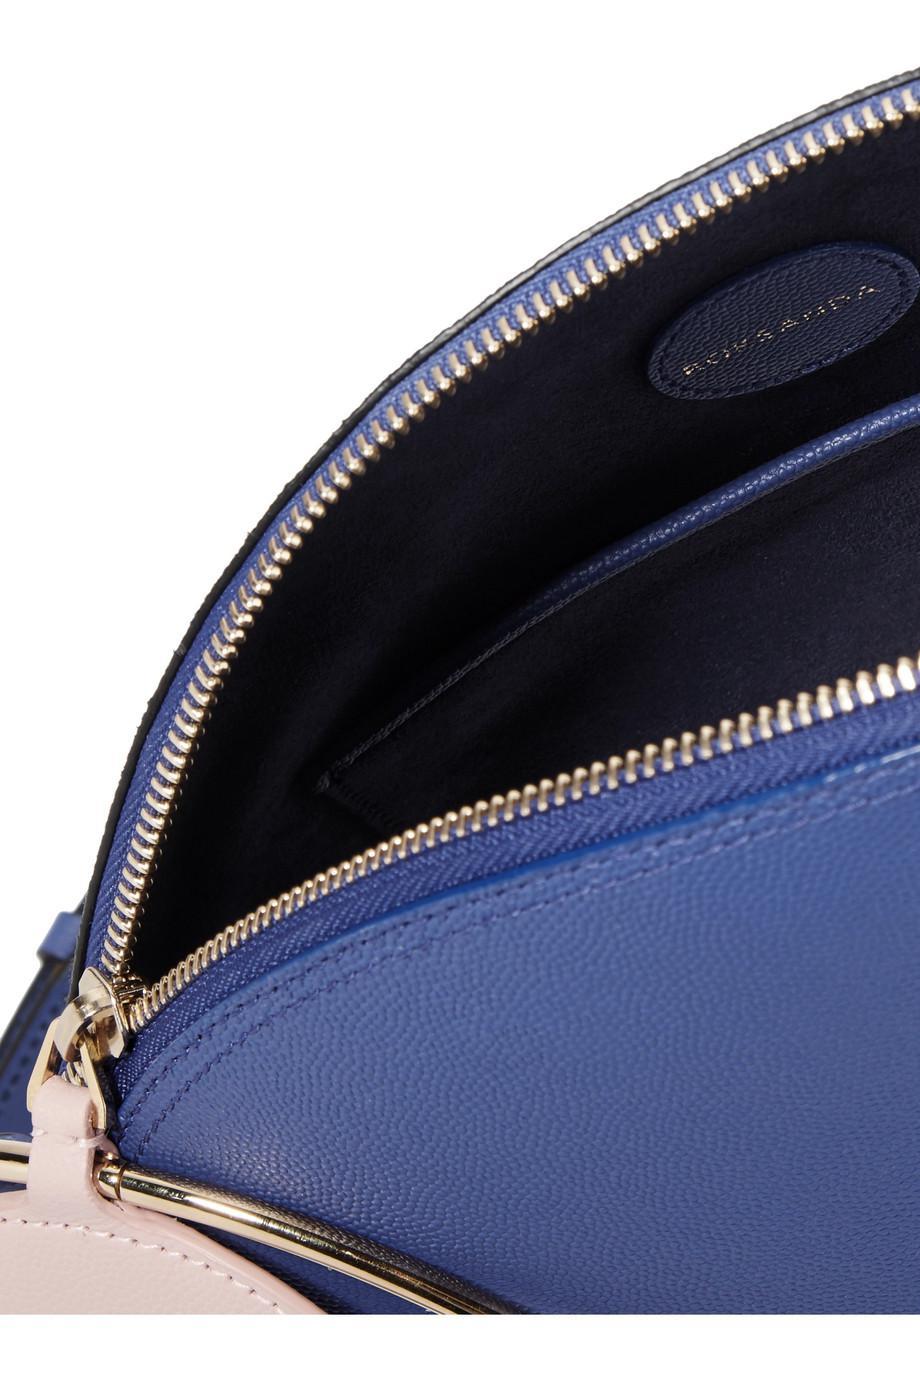 Eartha Couleur Bloc Moyen Sac À Bandoulière En Cuir Texturé - Ilincic De Roksanda Bleu Vif UTaBb9IqJ2